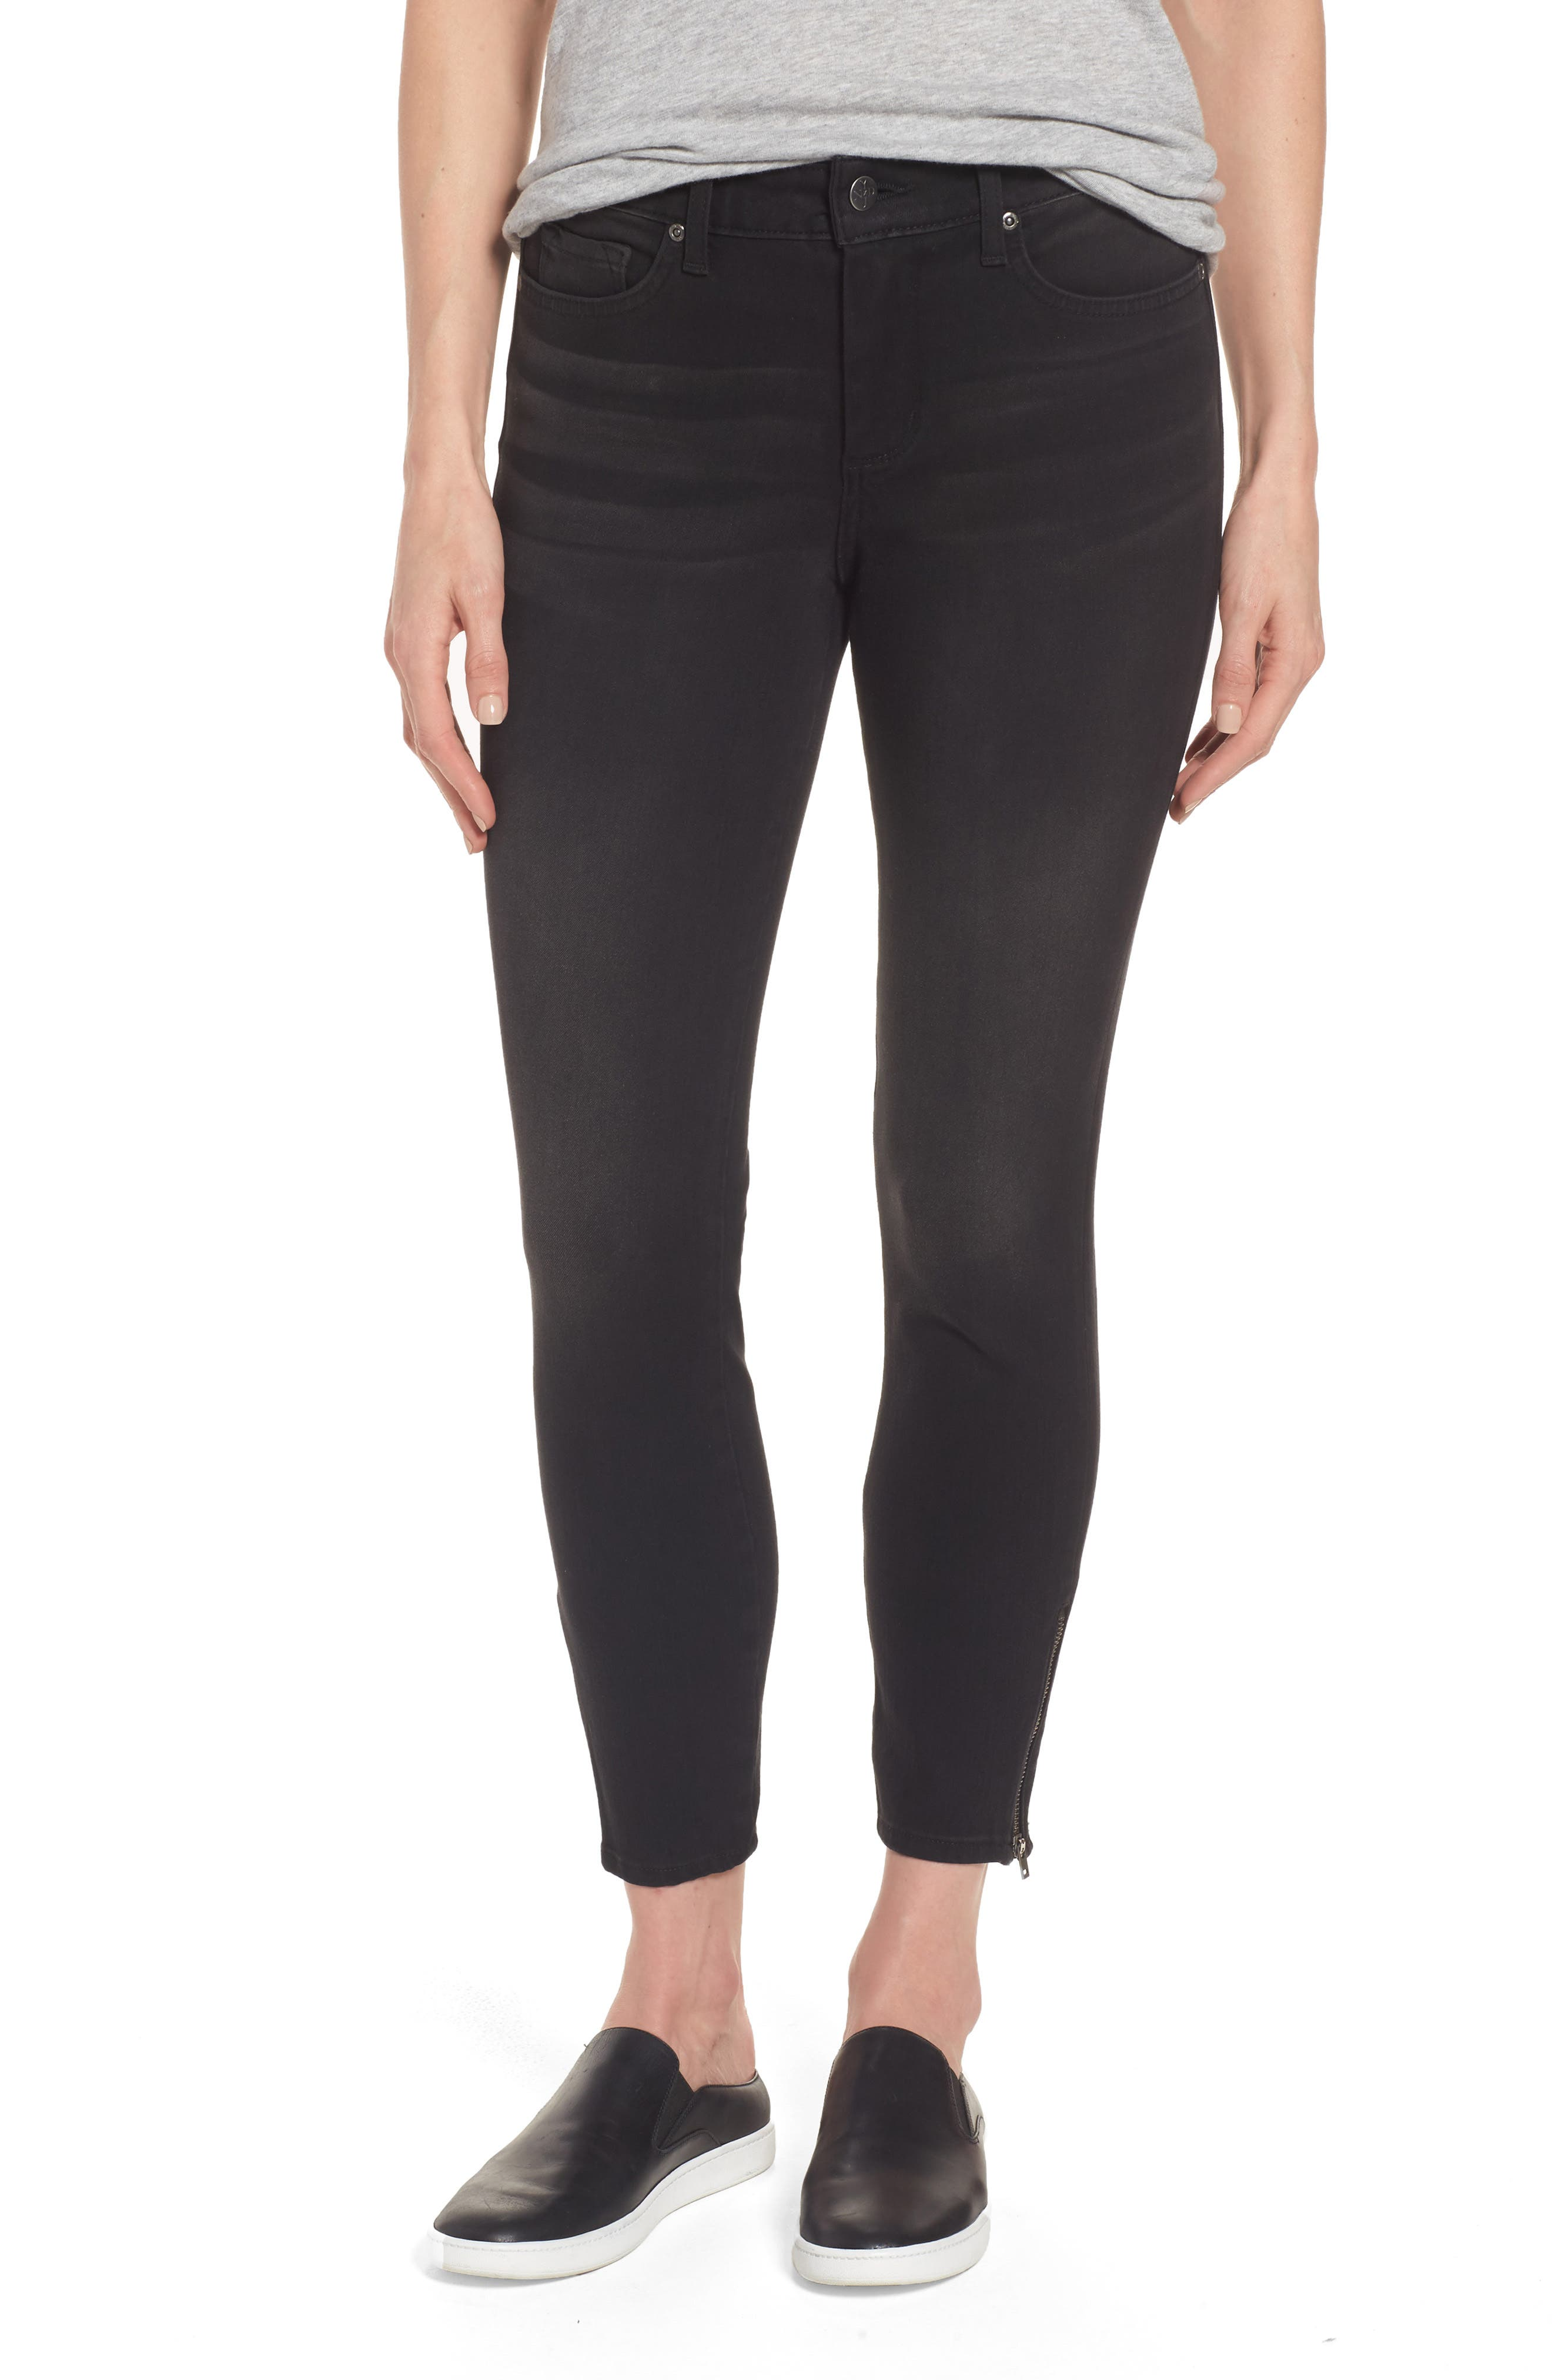 NYDJ Stretch Zip Ankle Jeans